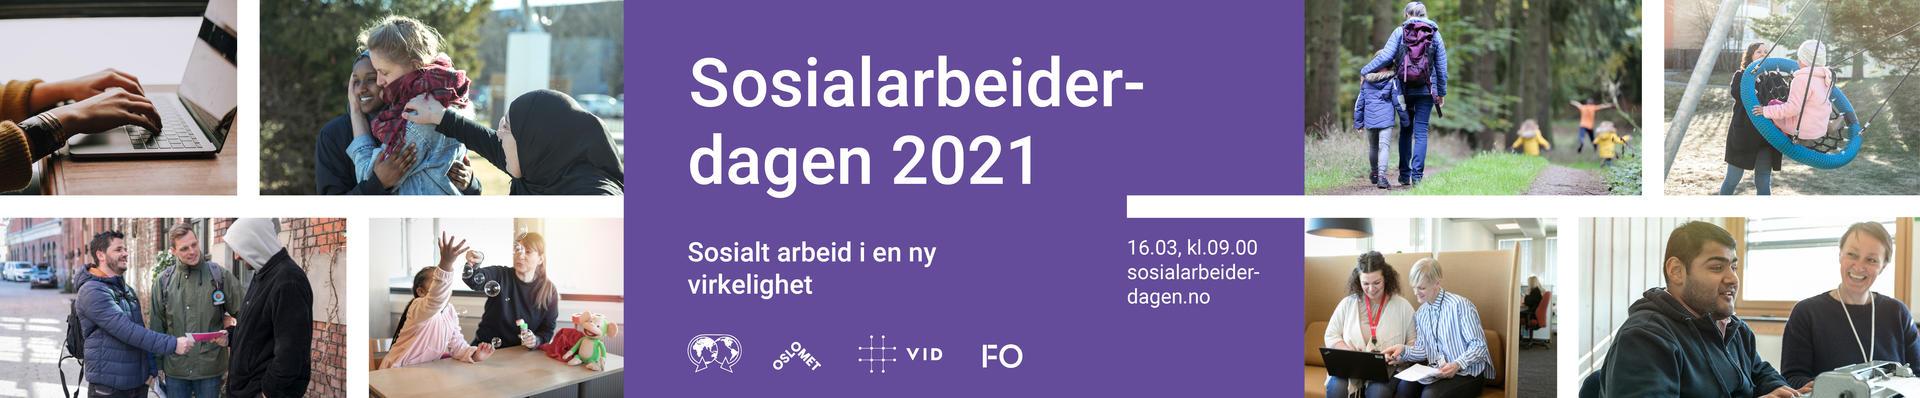 Sosialarbeiderdagen 2021